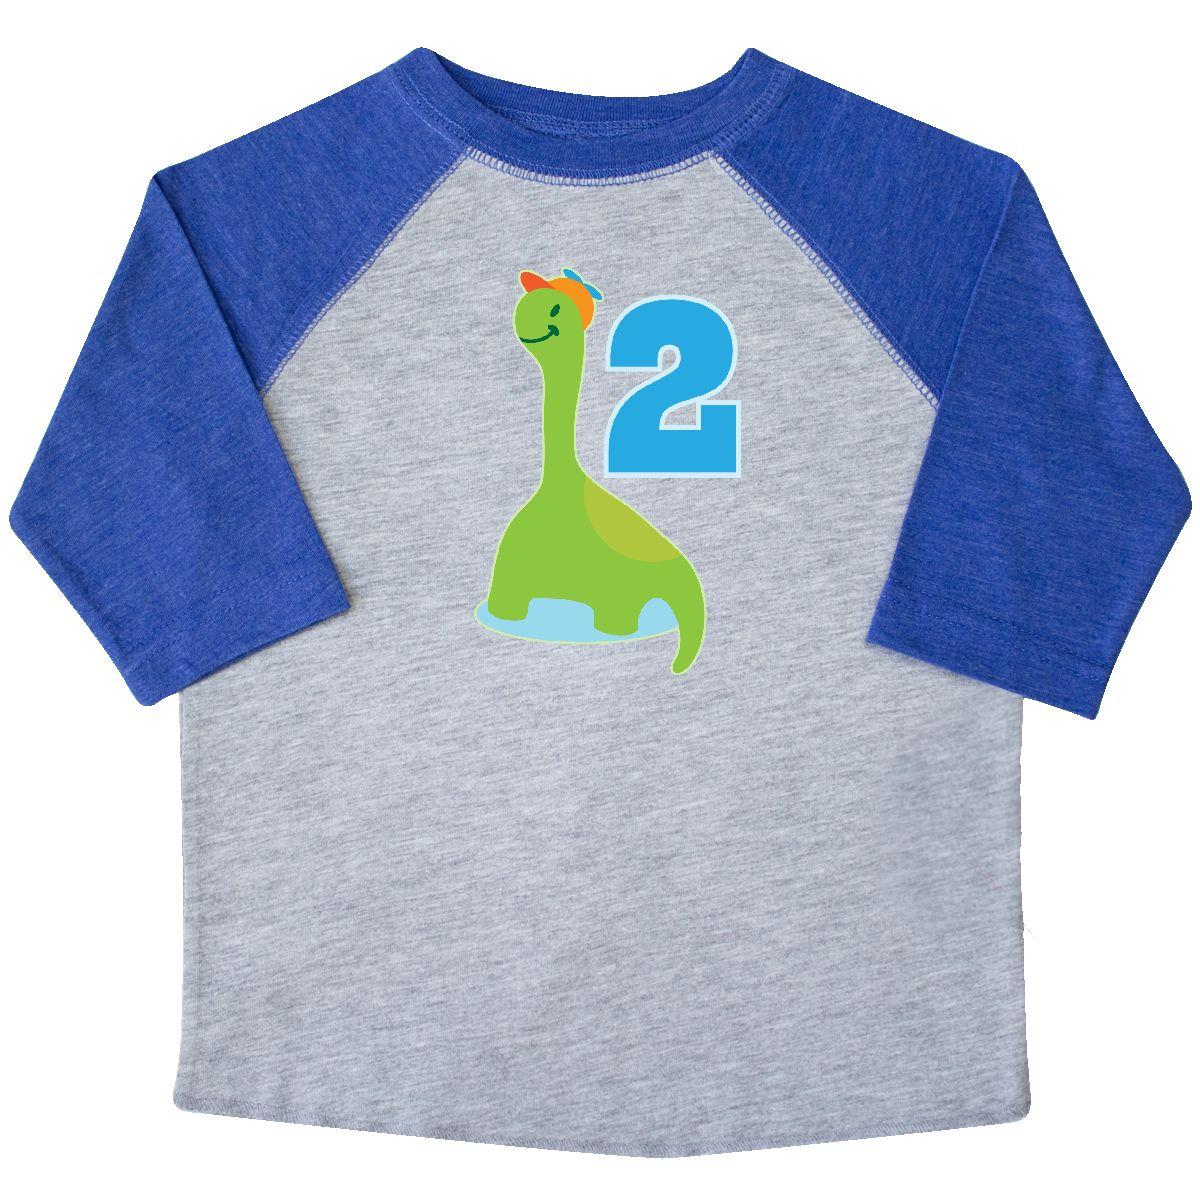 92fdbd0d Dinosaur 2nd Birthday Boys Cute Dino Toddler T-Shirt Heather and Royal 2T